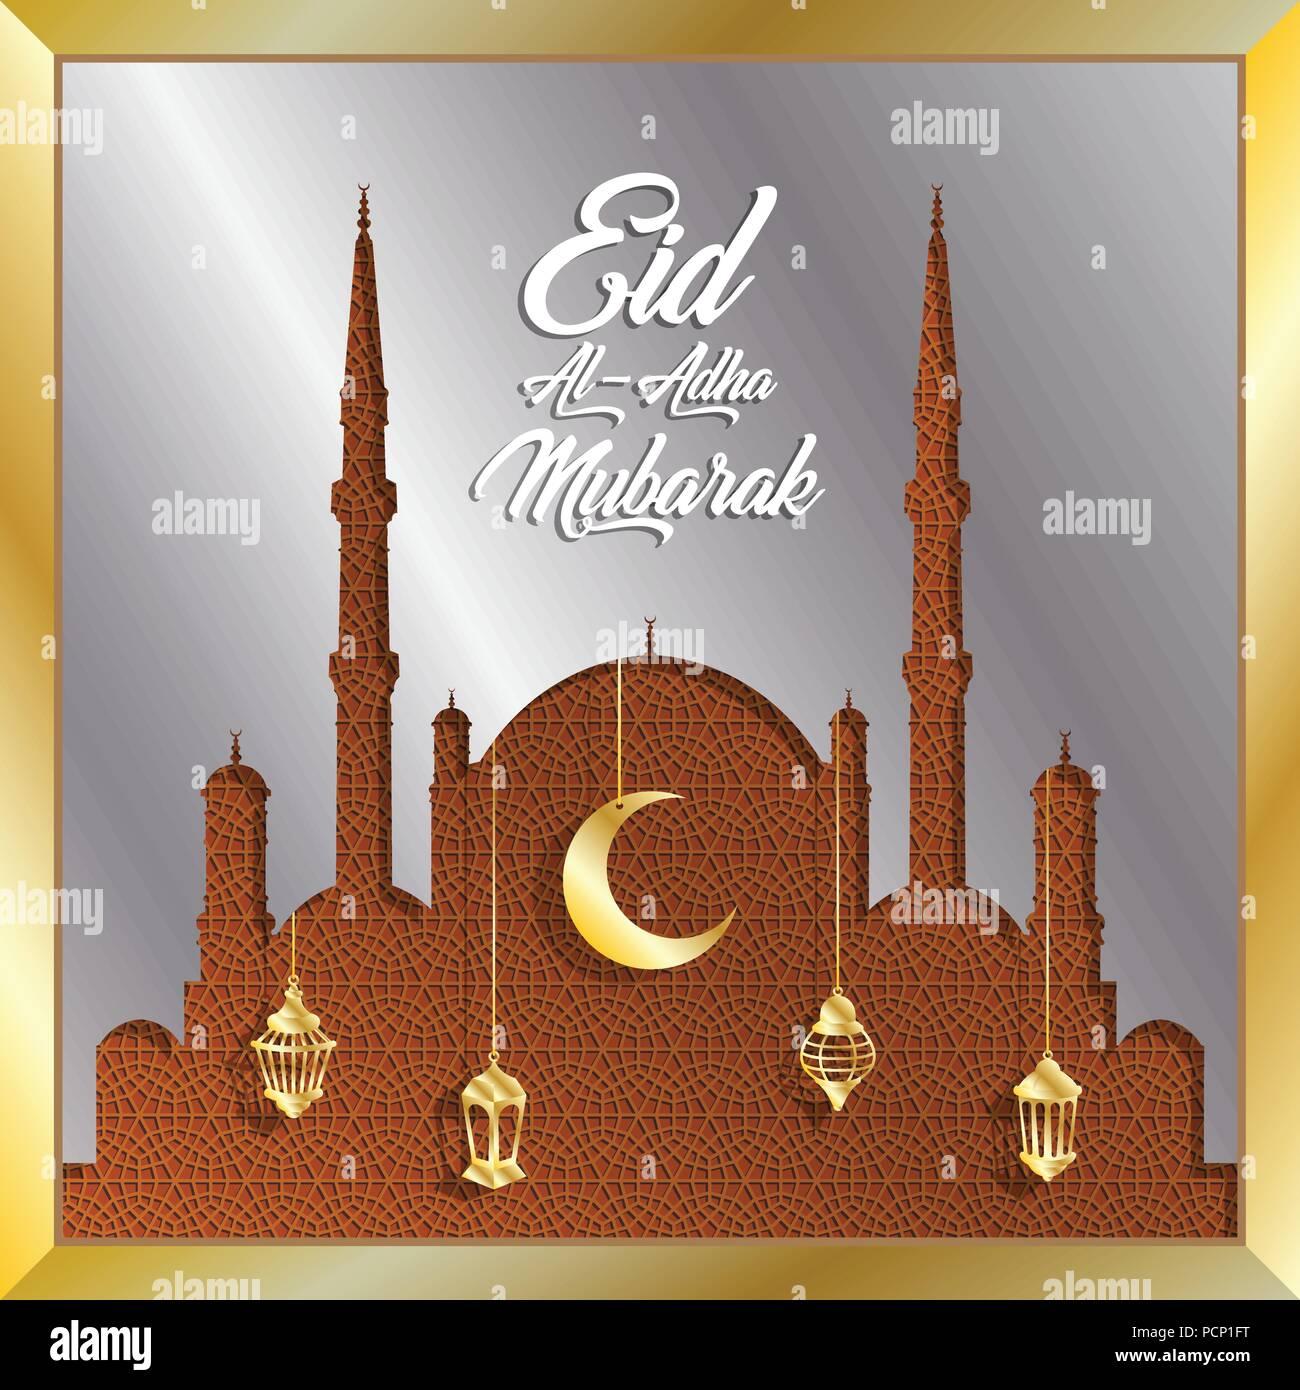 Arab Muslim Mosque Stock Vector Images Alamy